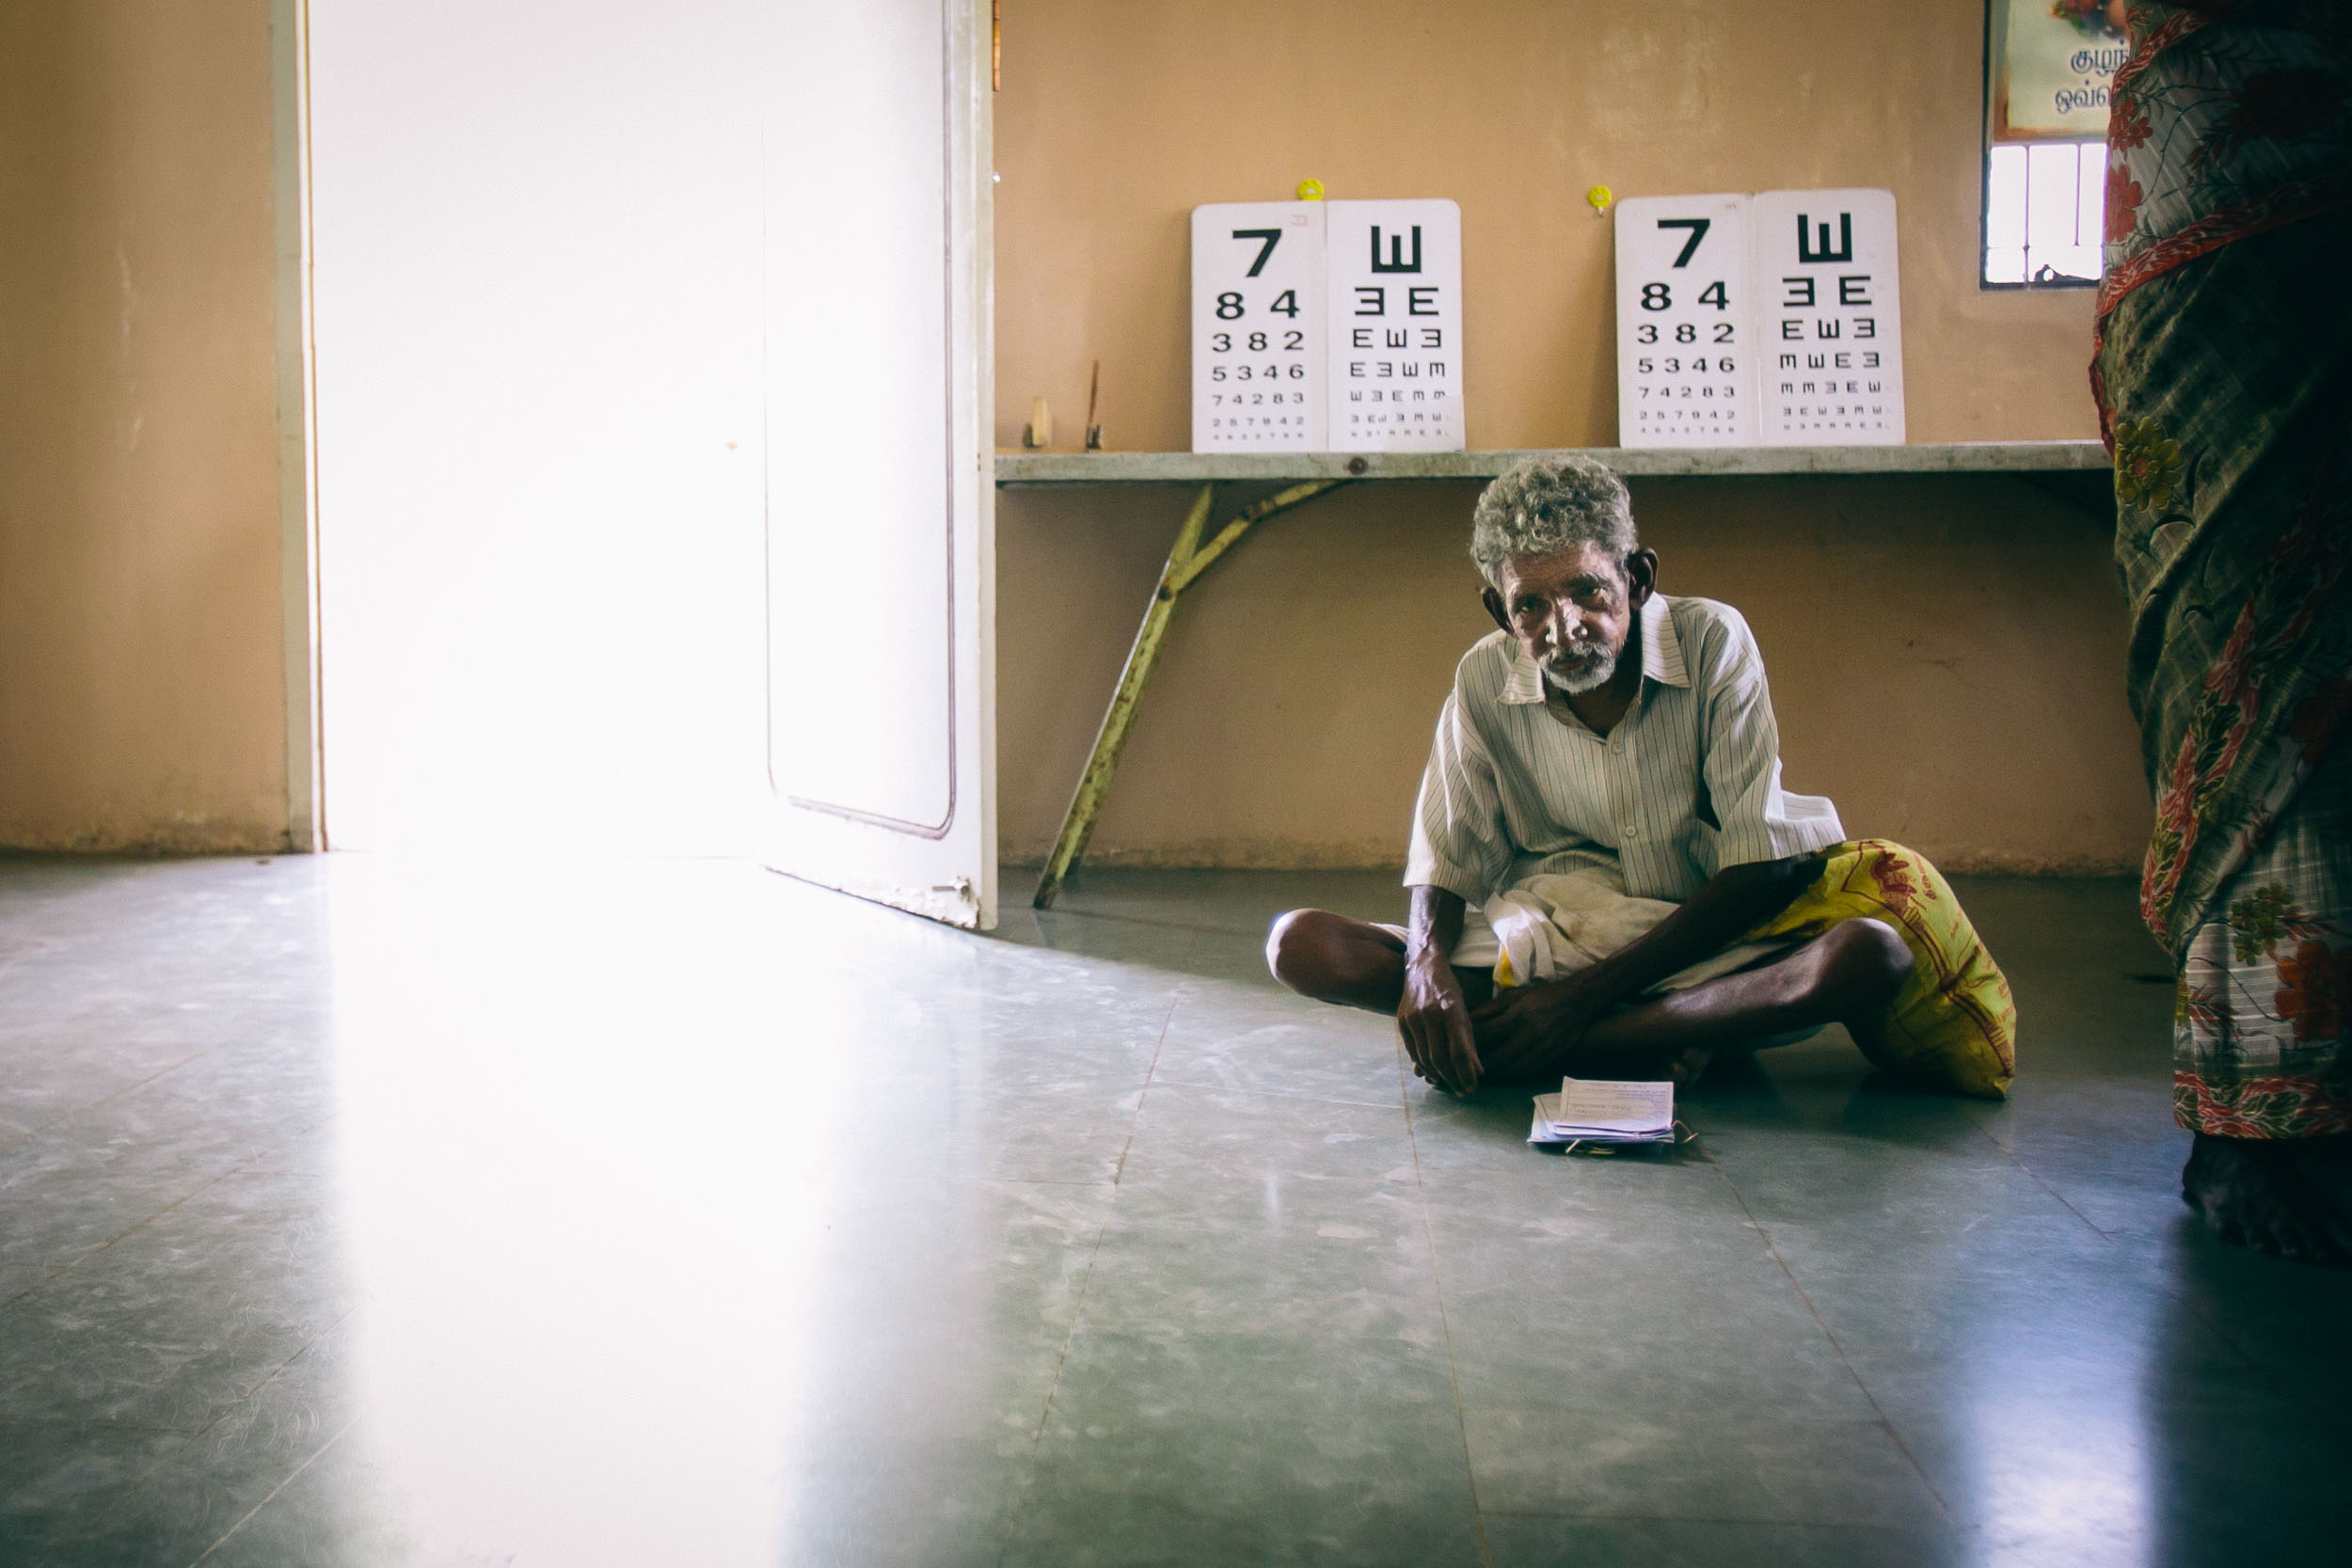 brian-callaway-india-photography-aravind-eye-hospital-12.jpg